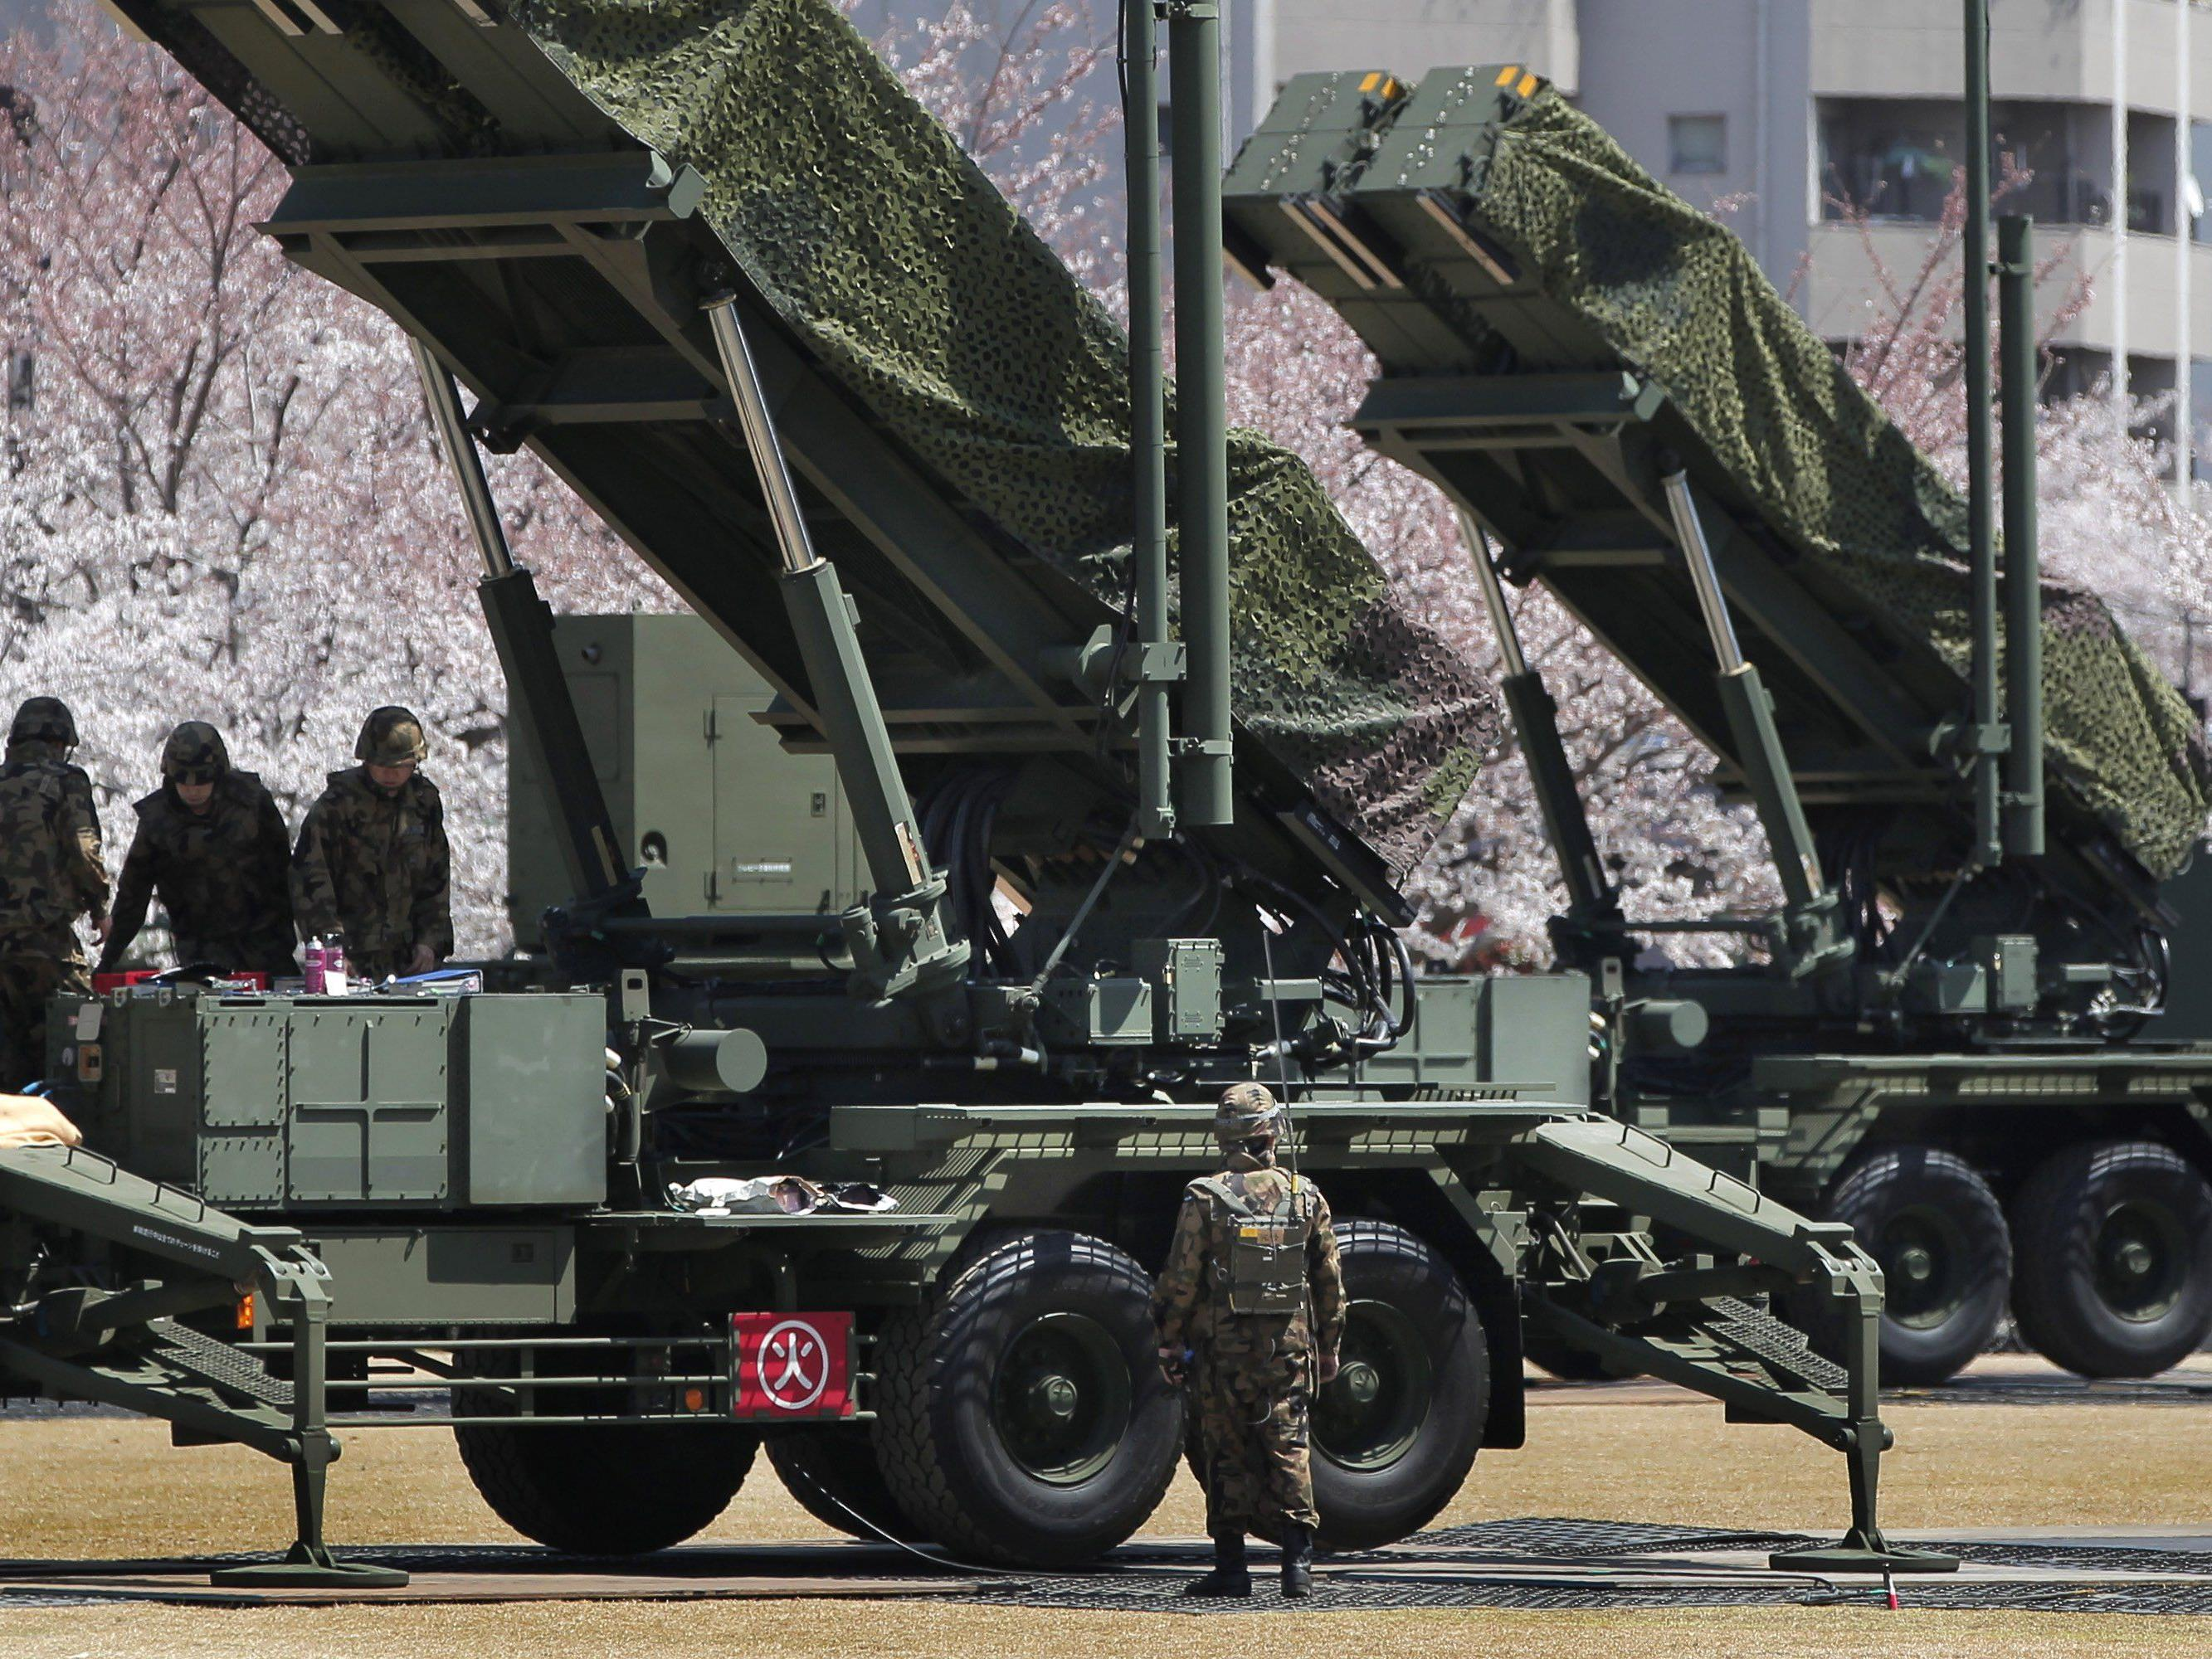 Einsatz dauerte drei Jahre lang - Begründung: Gesunkene Bedrohung durch Raketenangriffe.